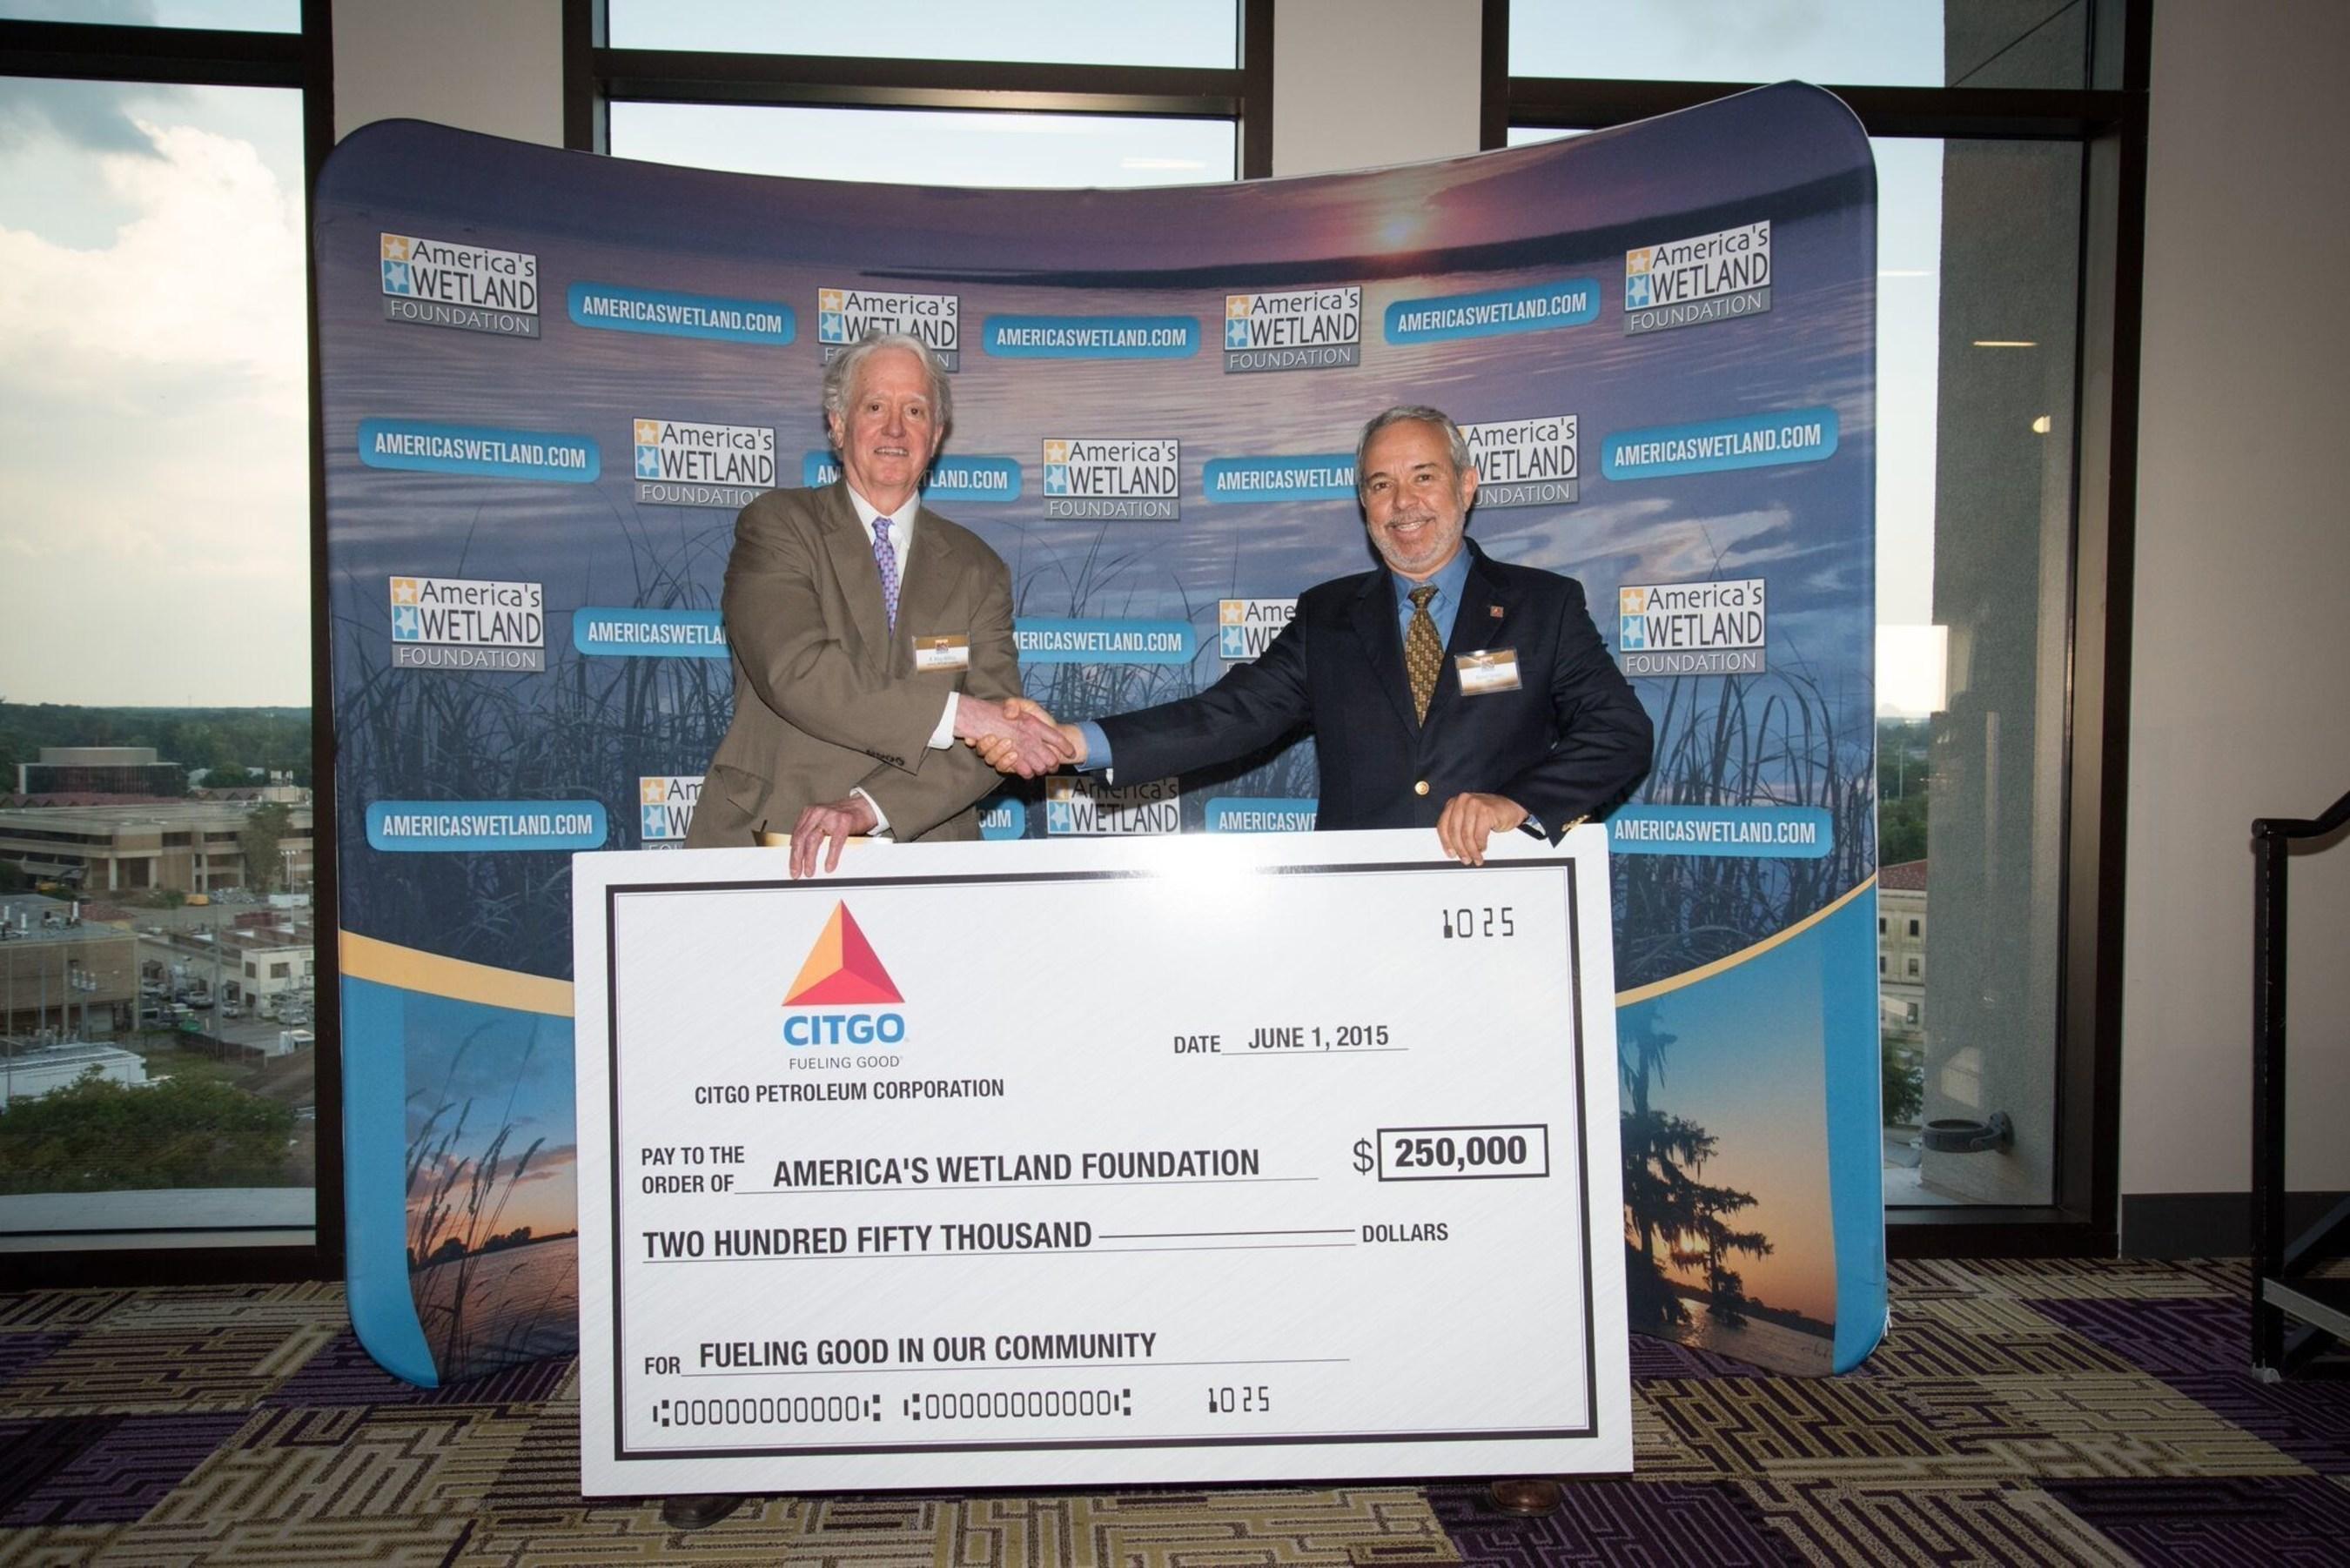 CITGO Supports America's WETLAND Foundation with Lafourche Parish Shoreline Restoration